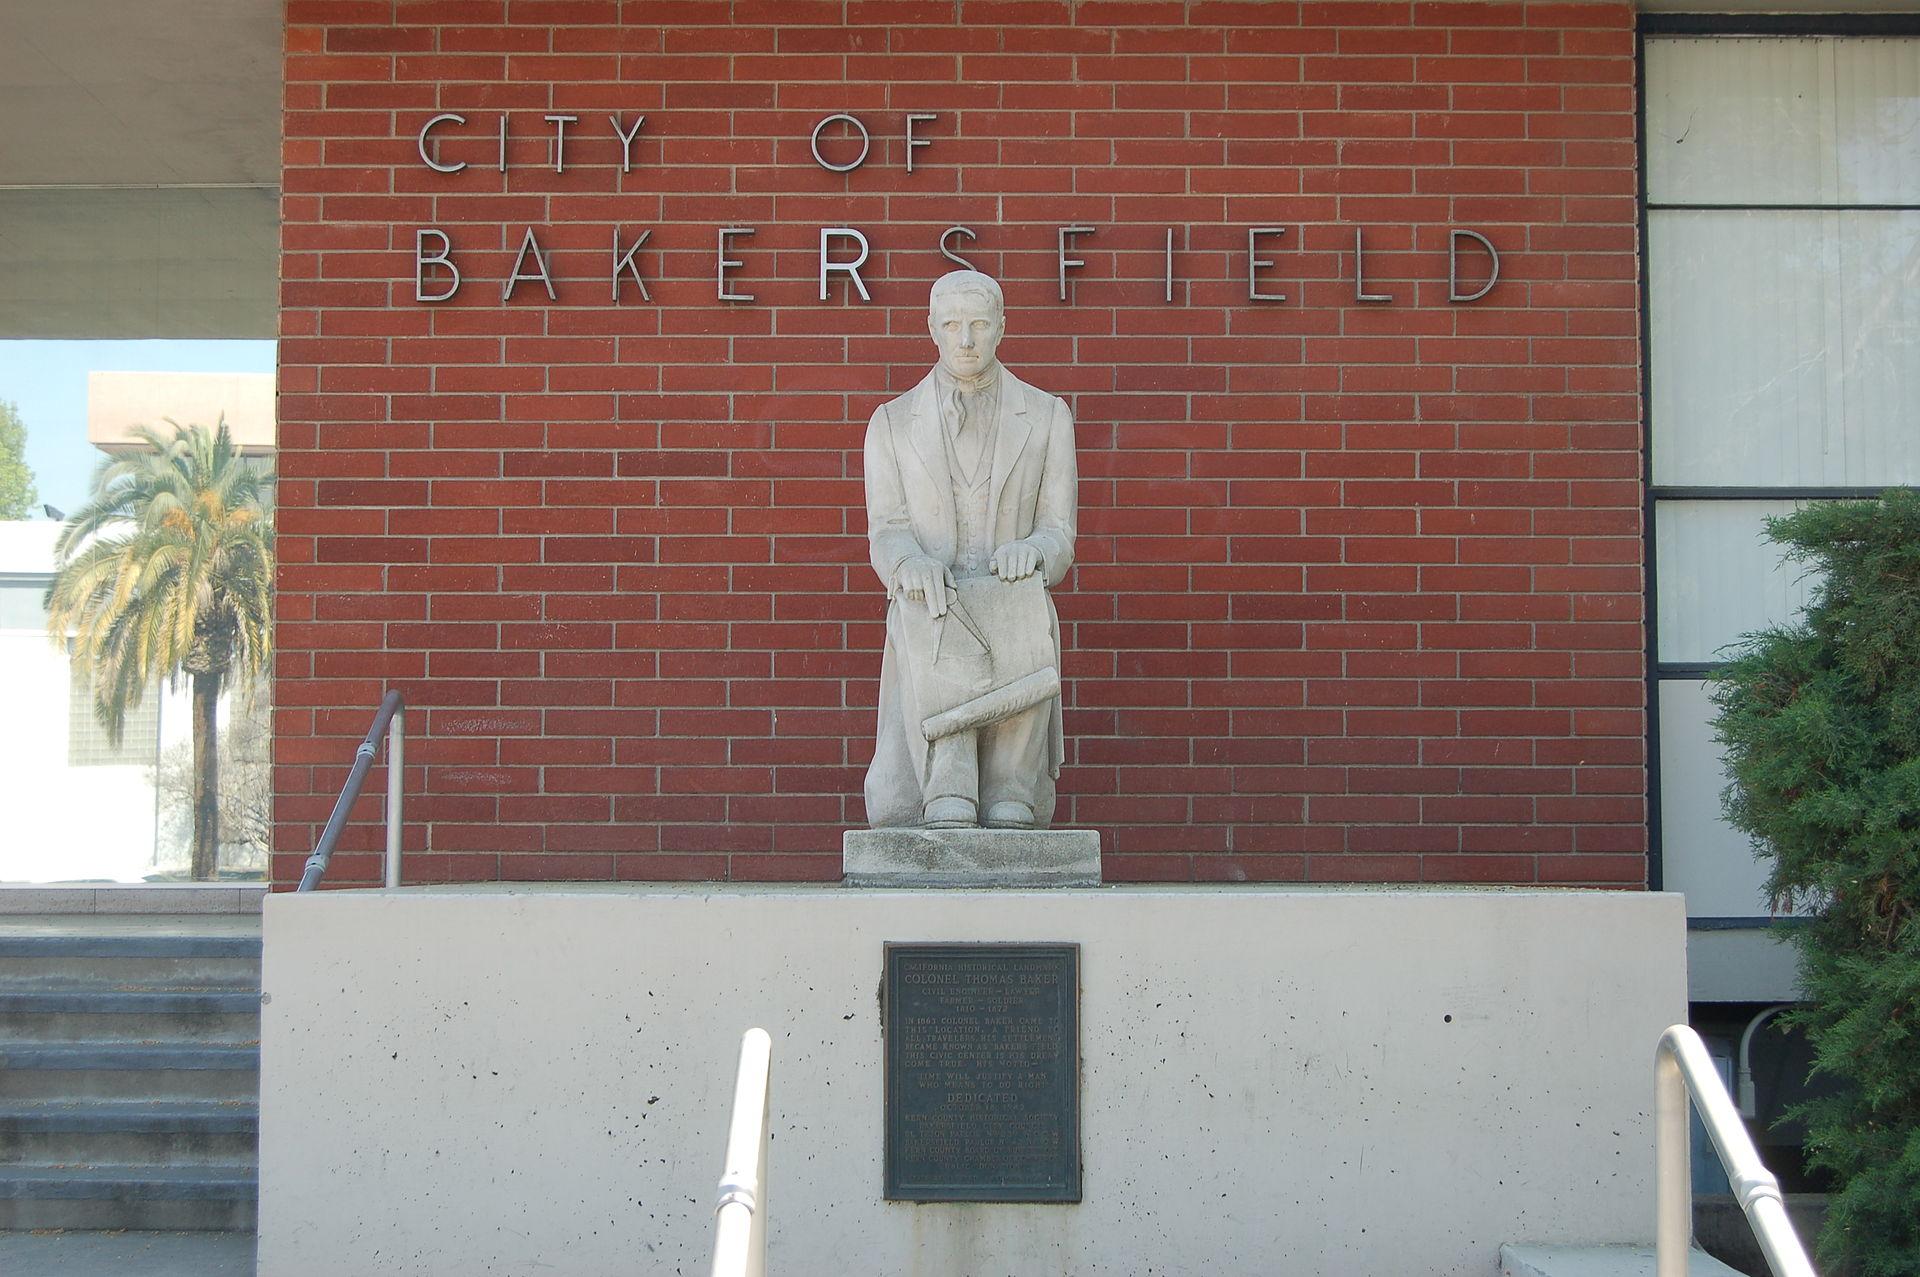 THE BAKERSFIELD BREEZE Bakersfield Breaking News Offers the Latest News in Bakersfield, California